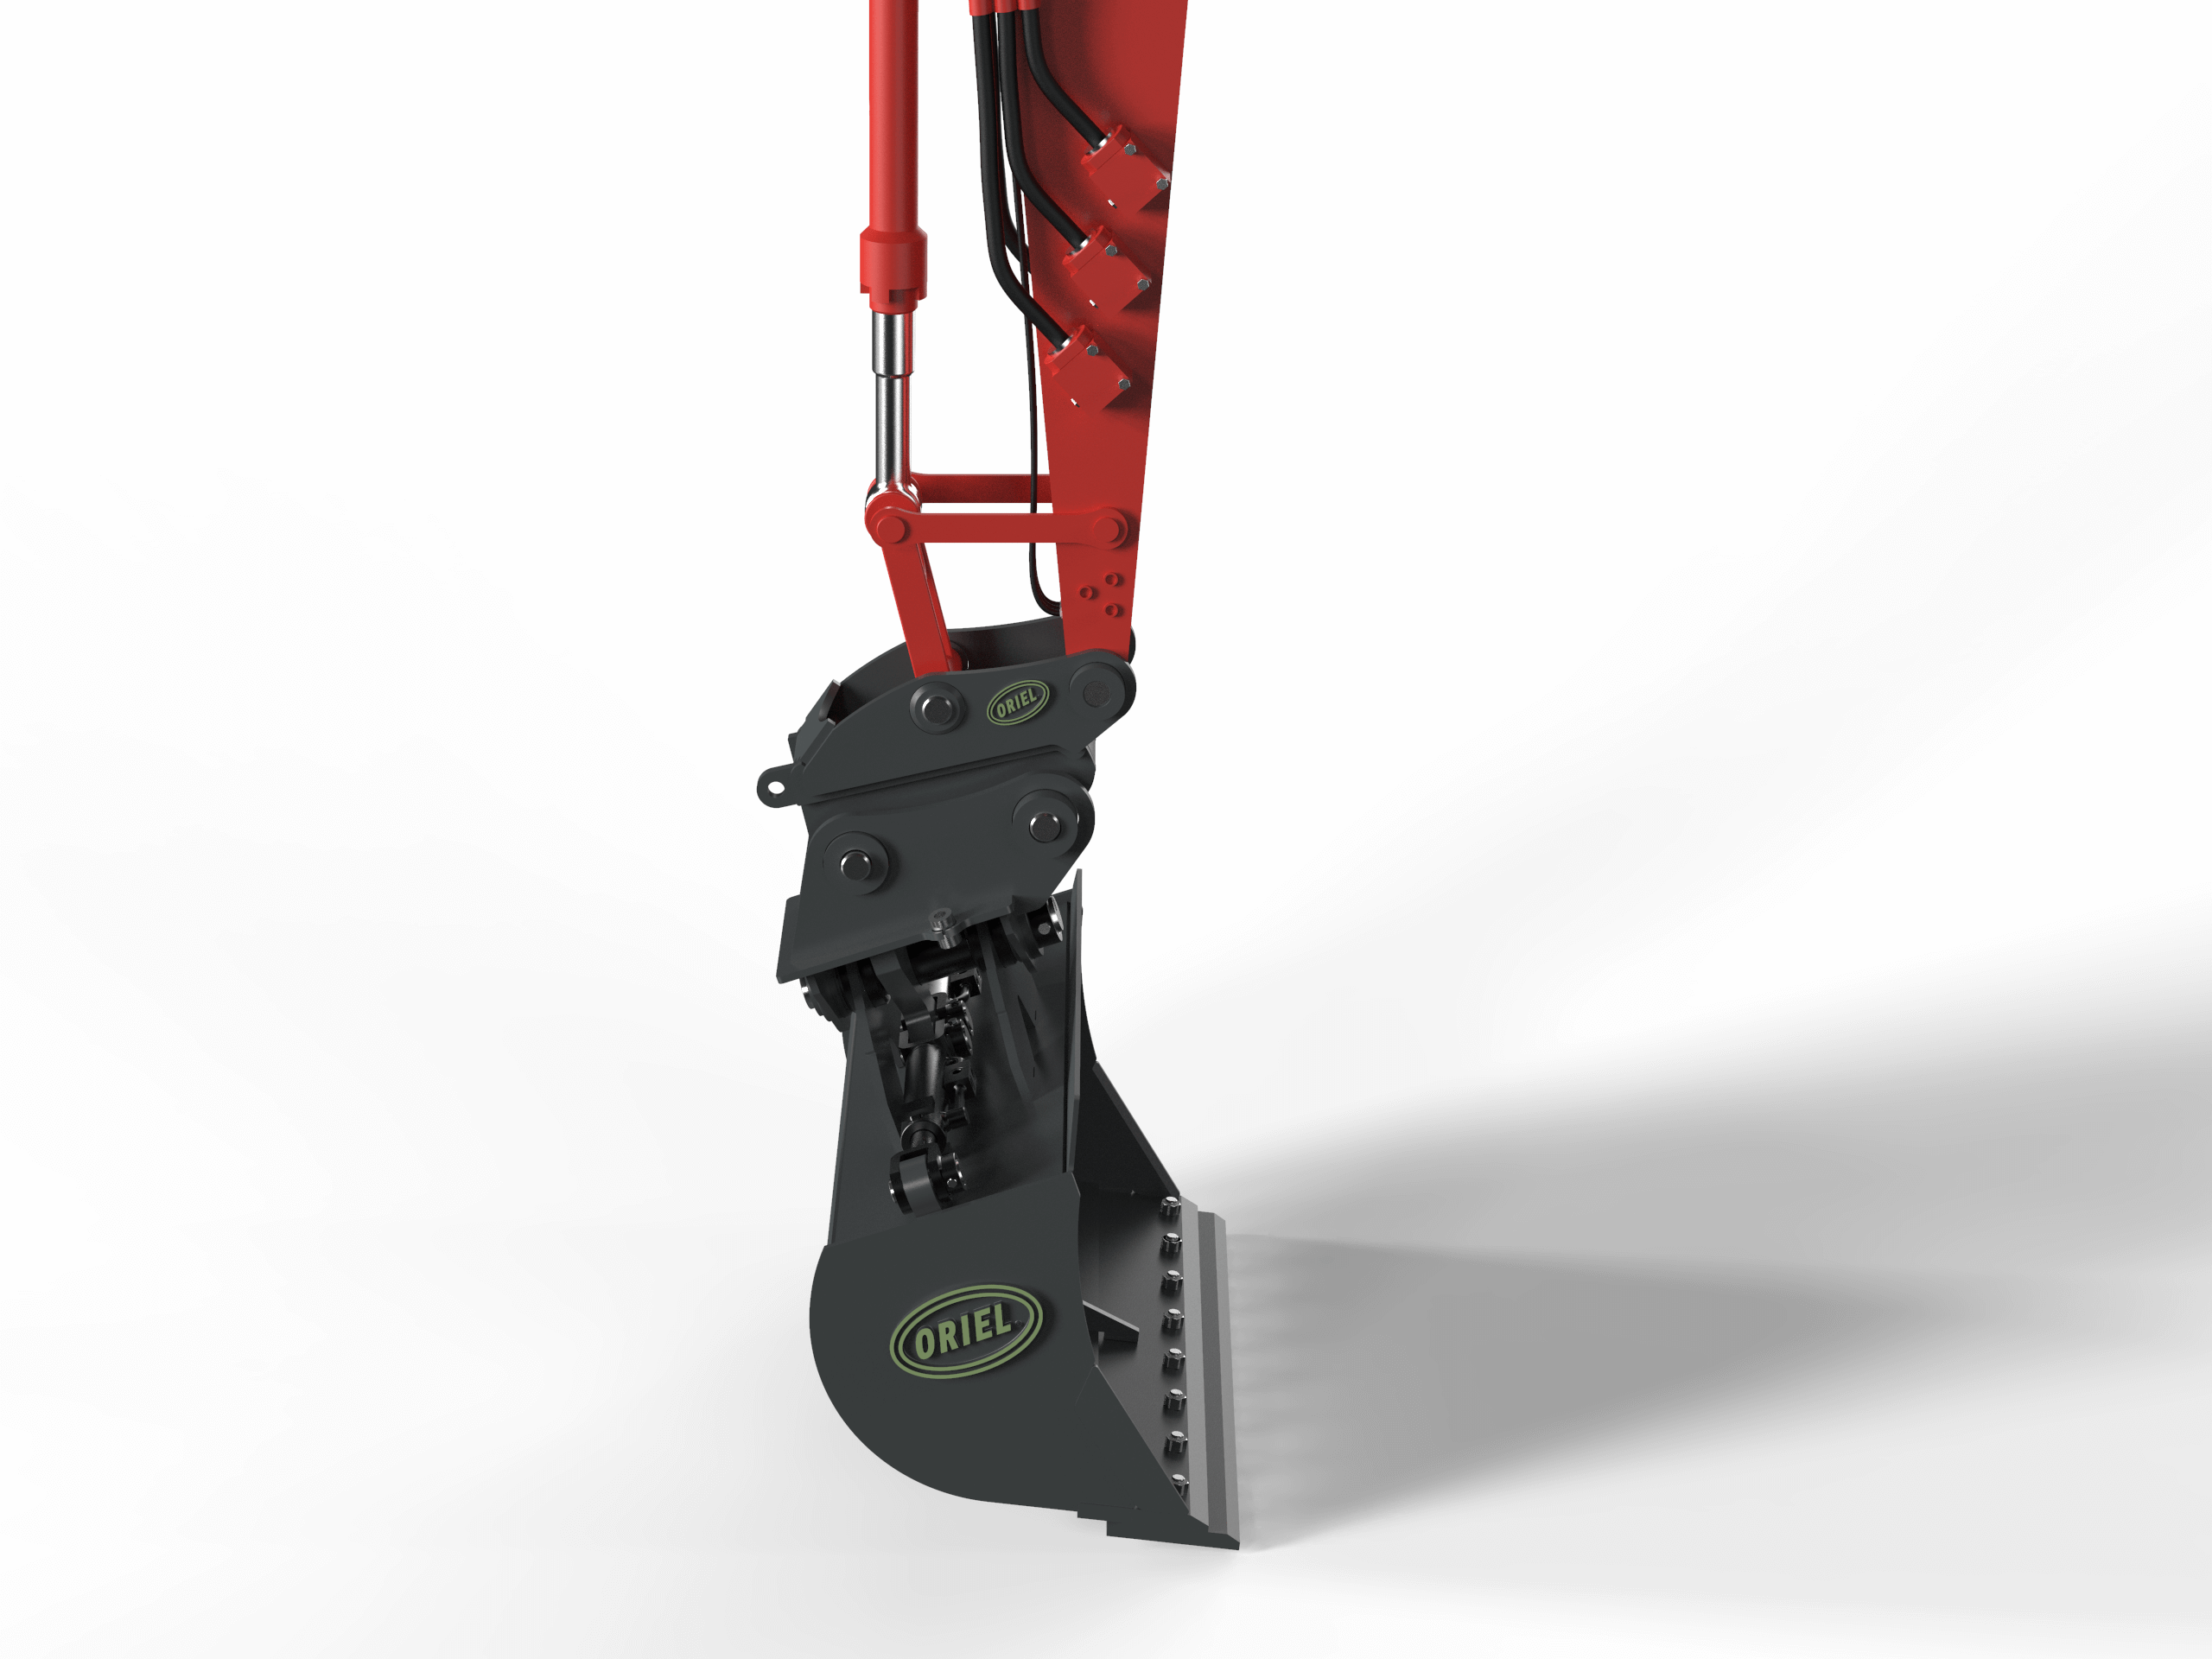 Angle-Tilt Bucket